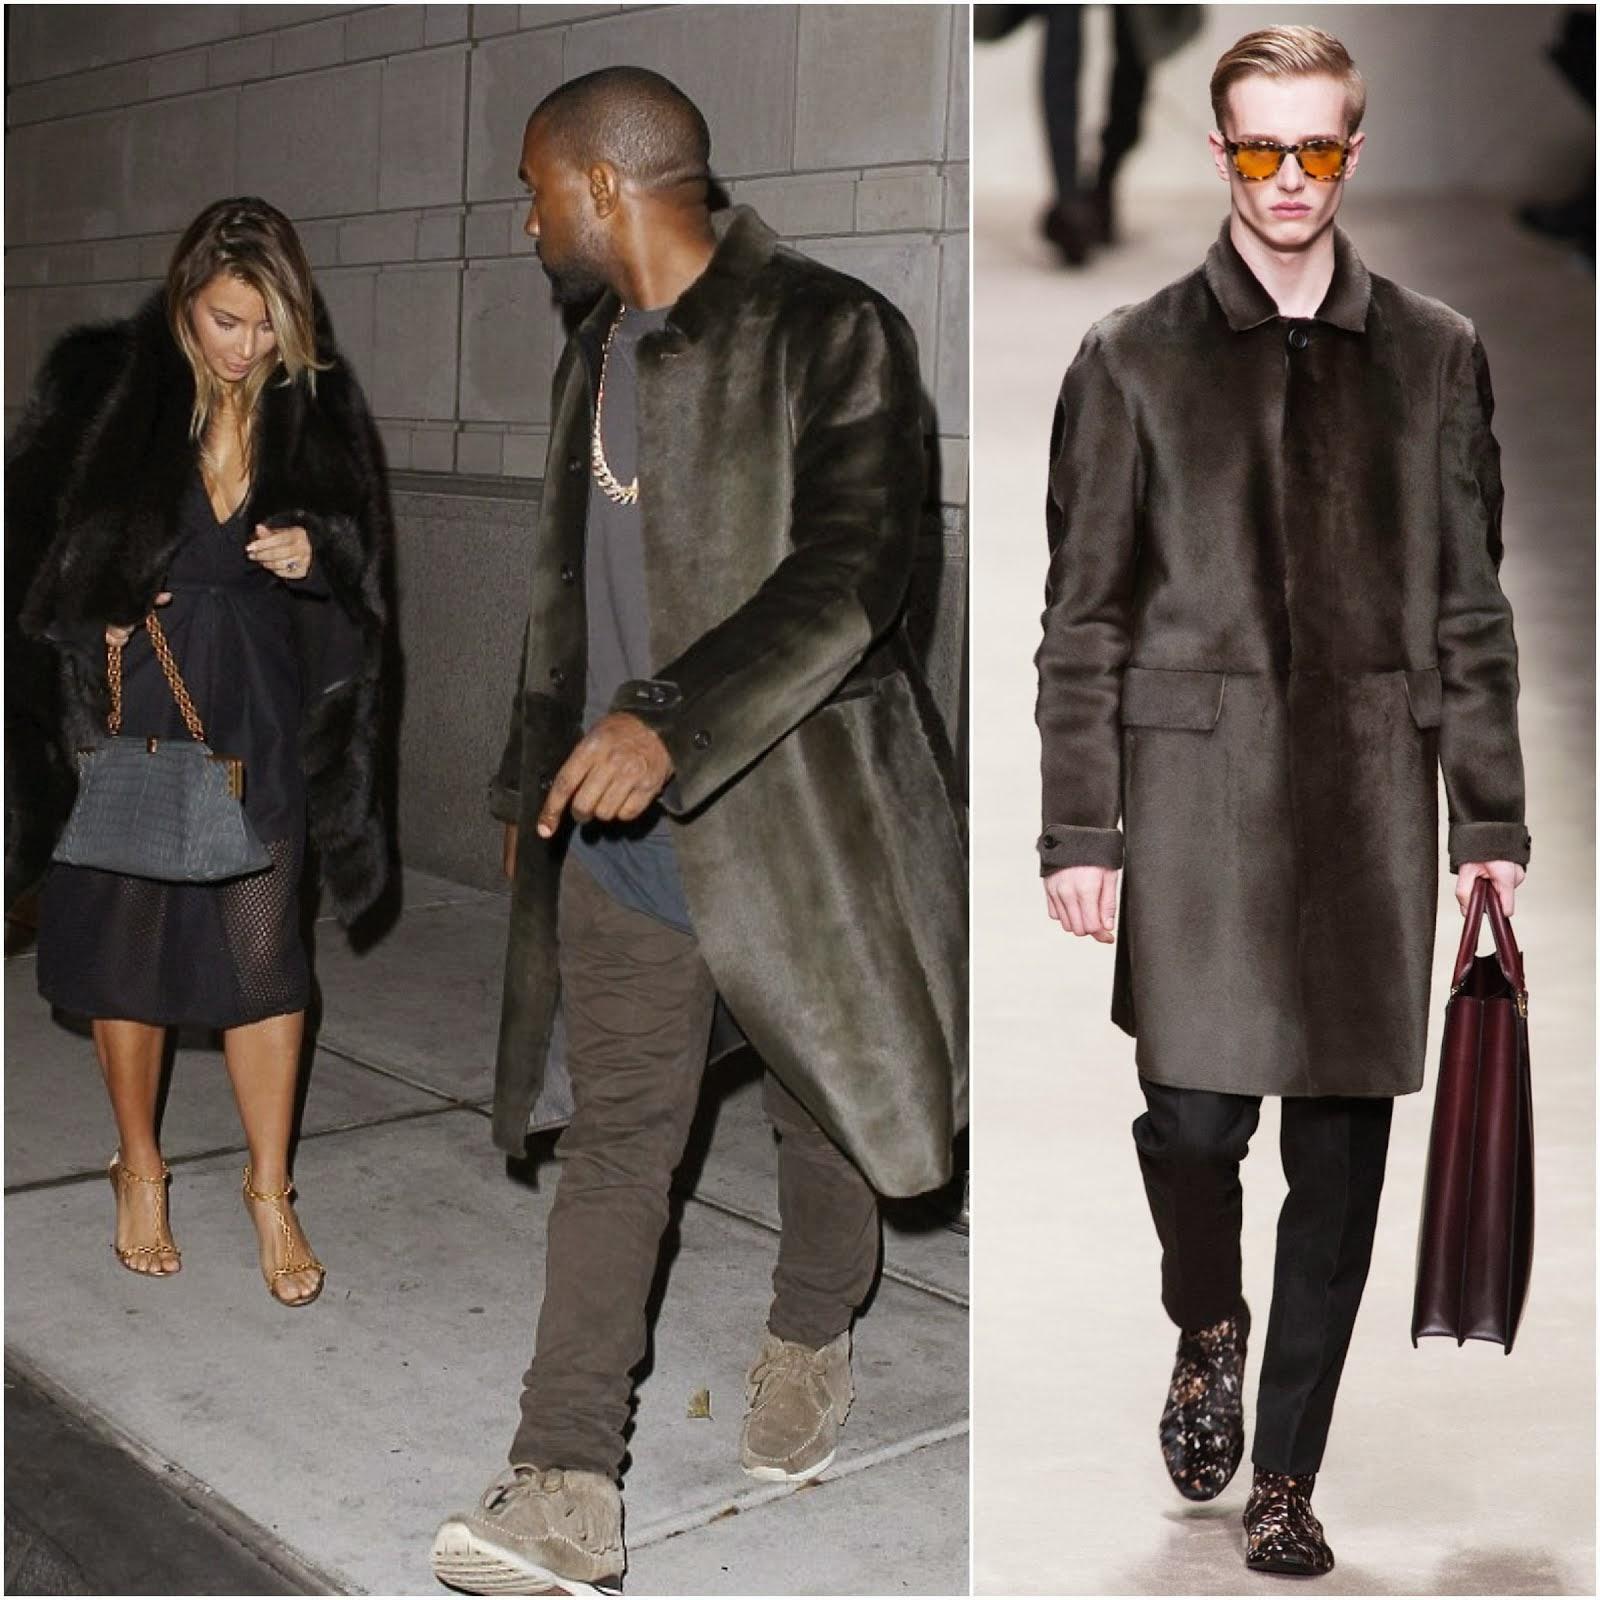 Kanye West in BURBERRY PRORSUM SHEARLING COAT - - Philadelphia Street Style November 2013